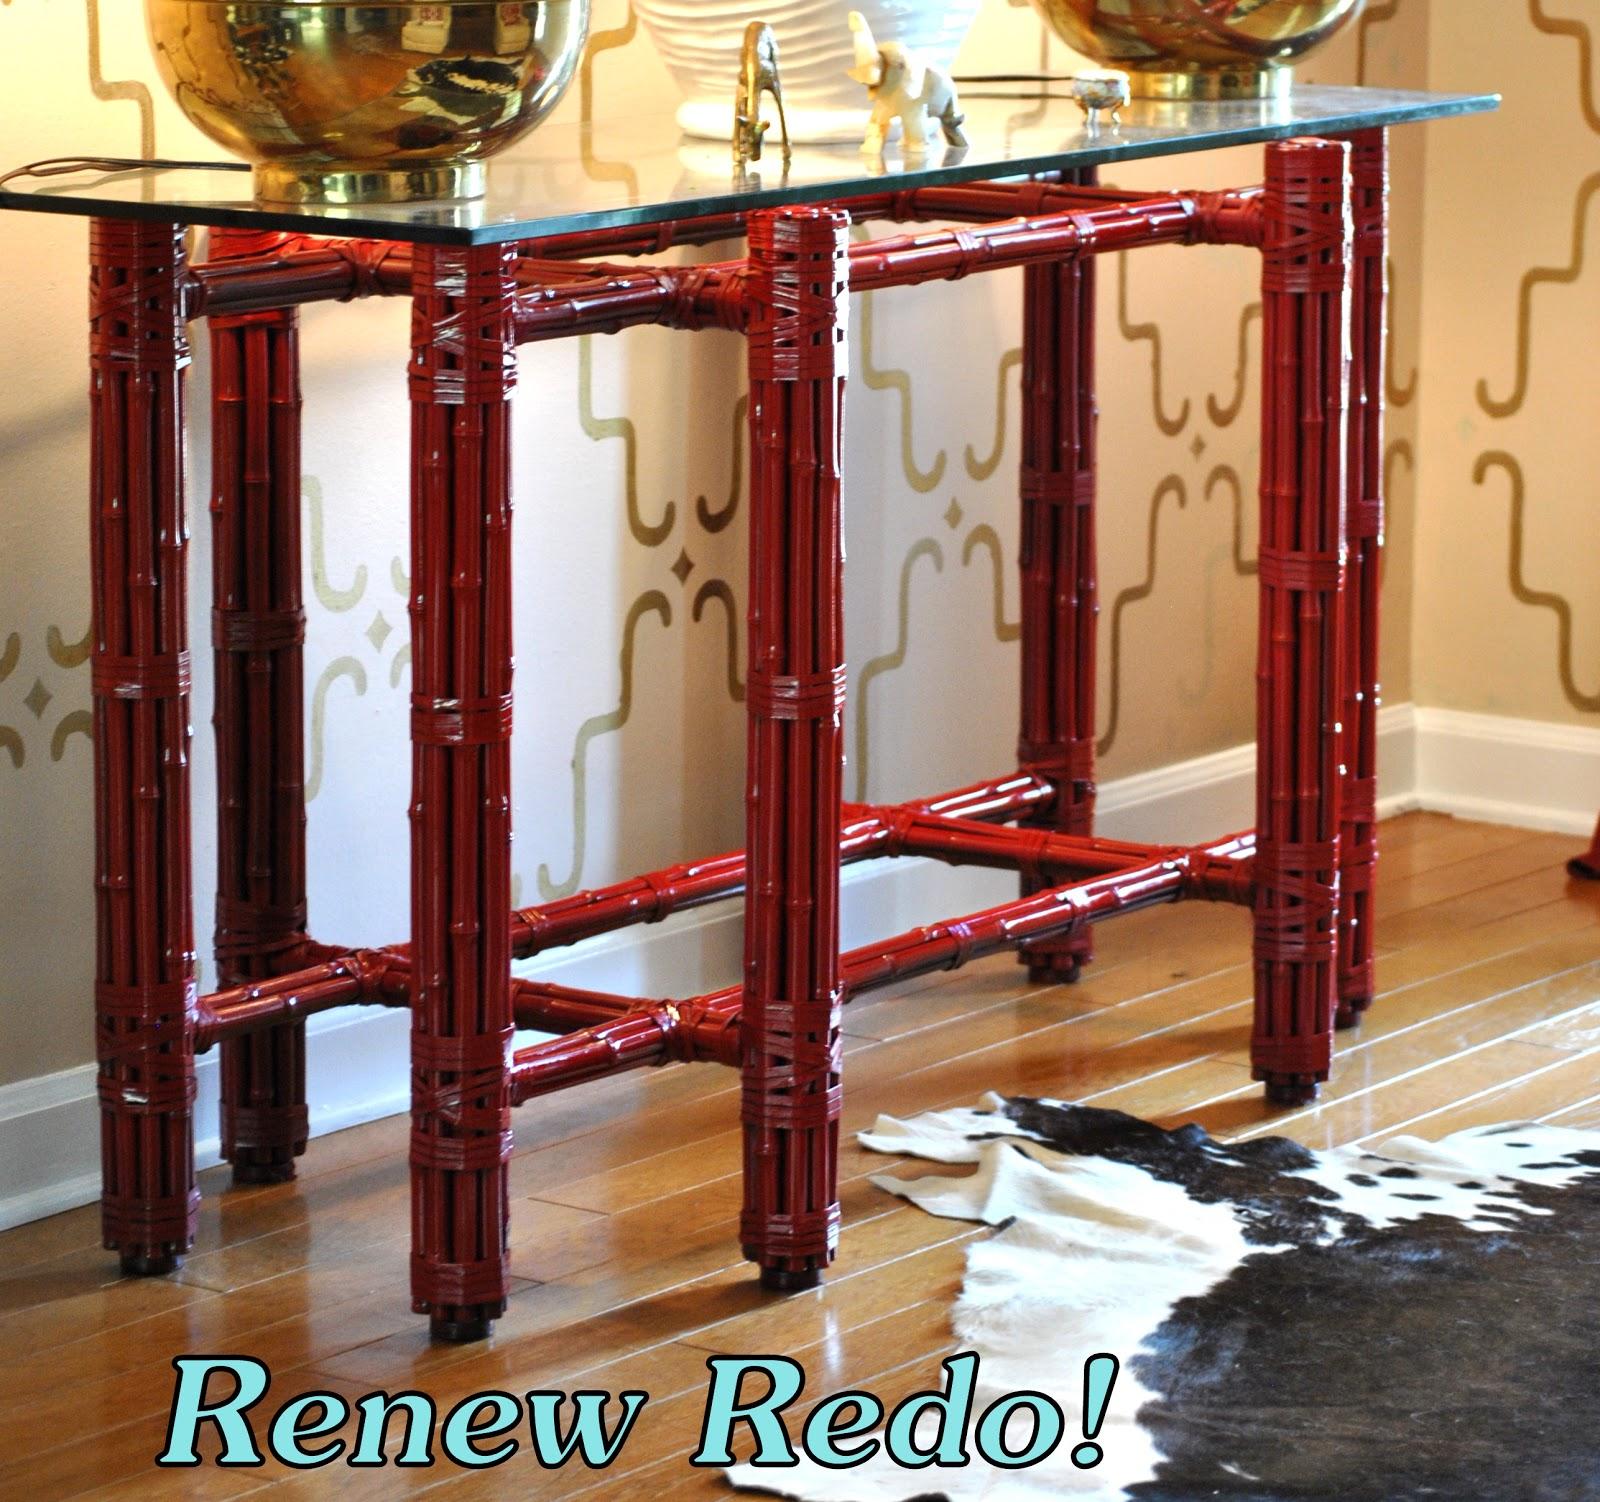 renew redo high gloss red repurposed dining table